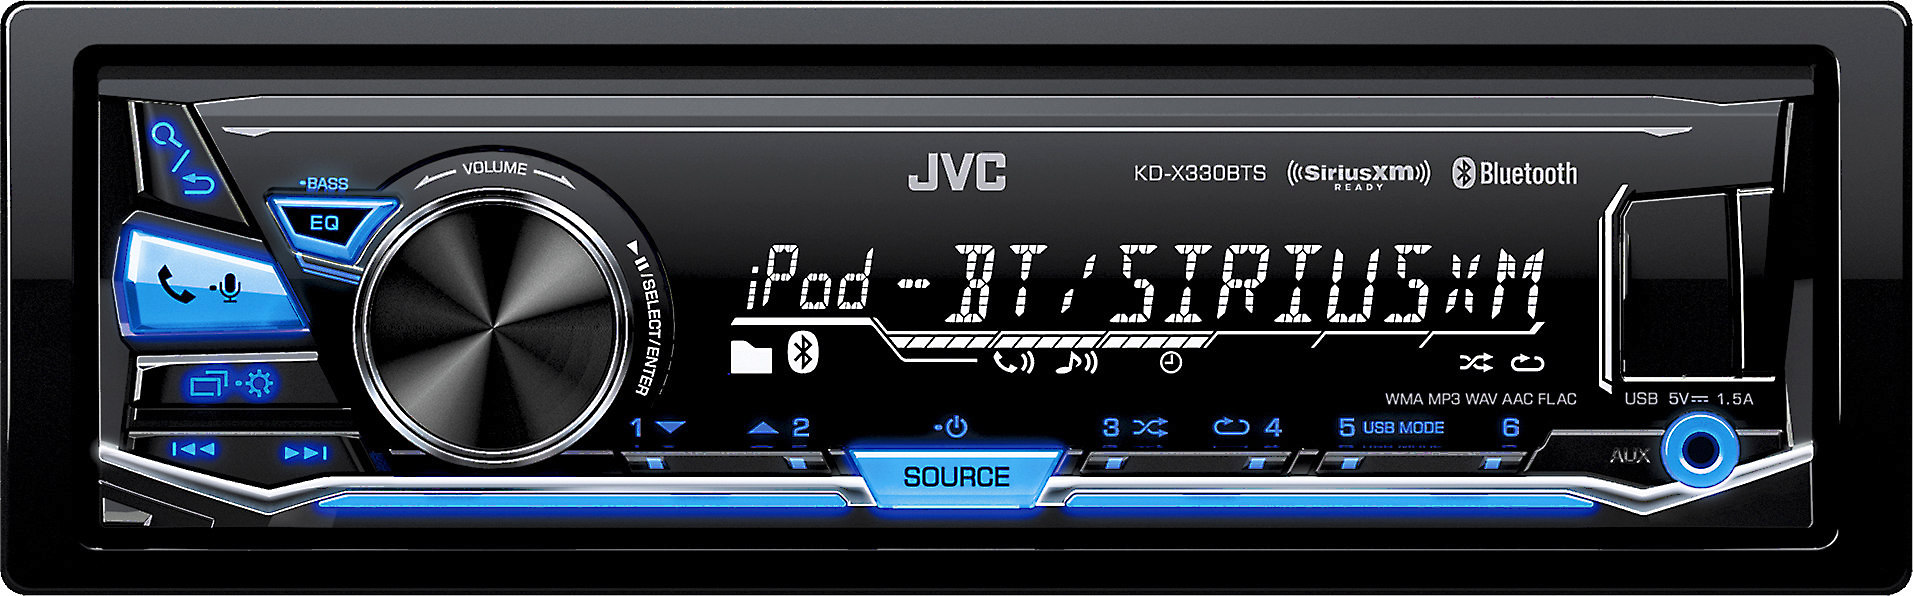 jvc kd x330bts digital media receiver (does not play cds) at JVC R330 Wiring-Diagram jvc kd x330bts digital media receiver (does not play cds) at crutchfield com